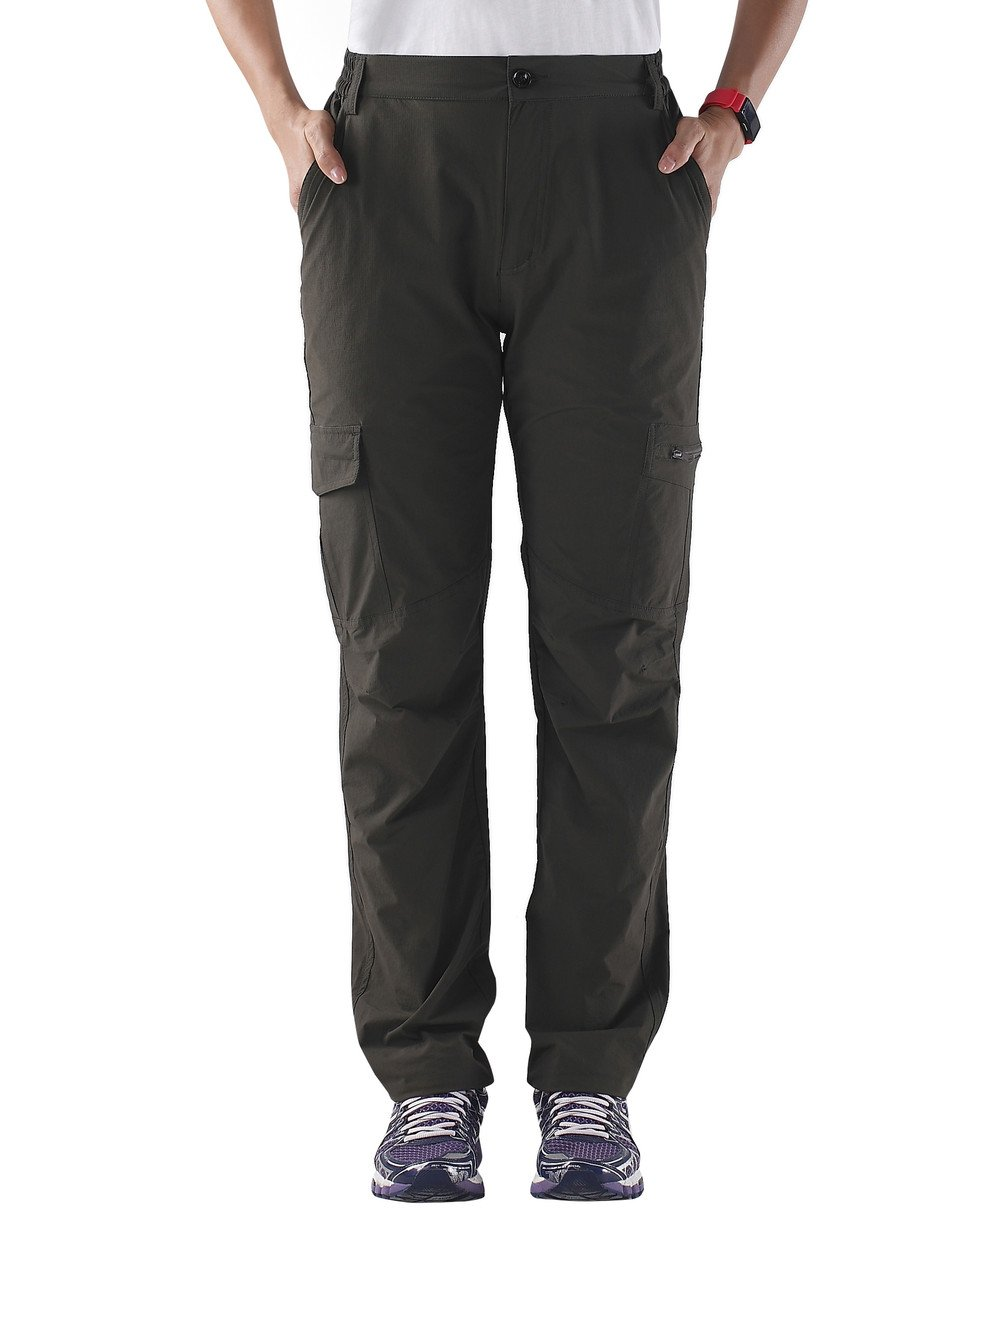 Unitop Women's Quick Dry Sportswear Hiking Pants